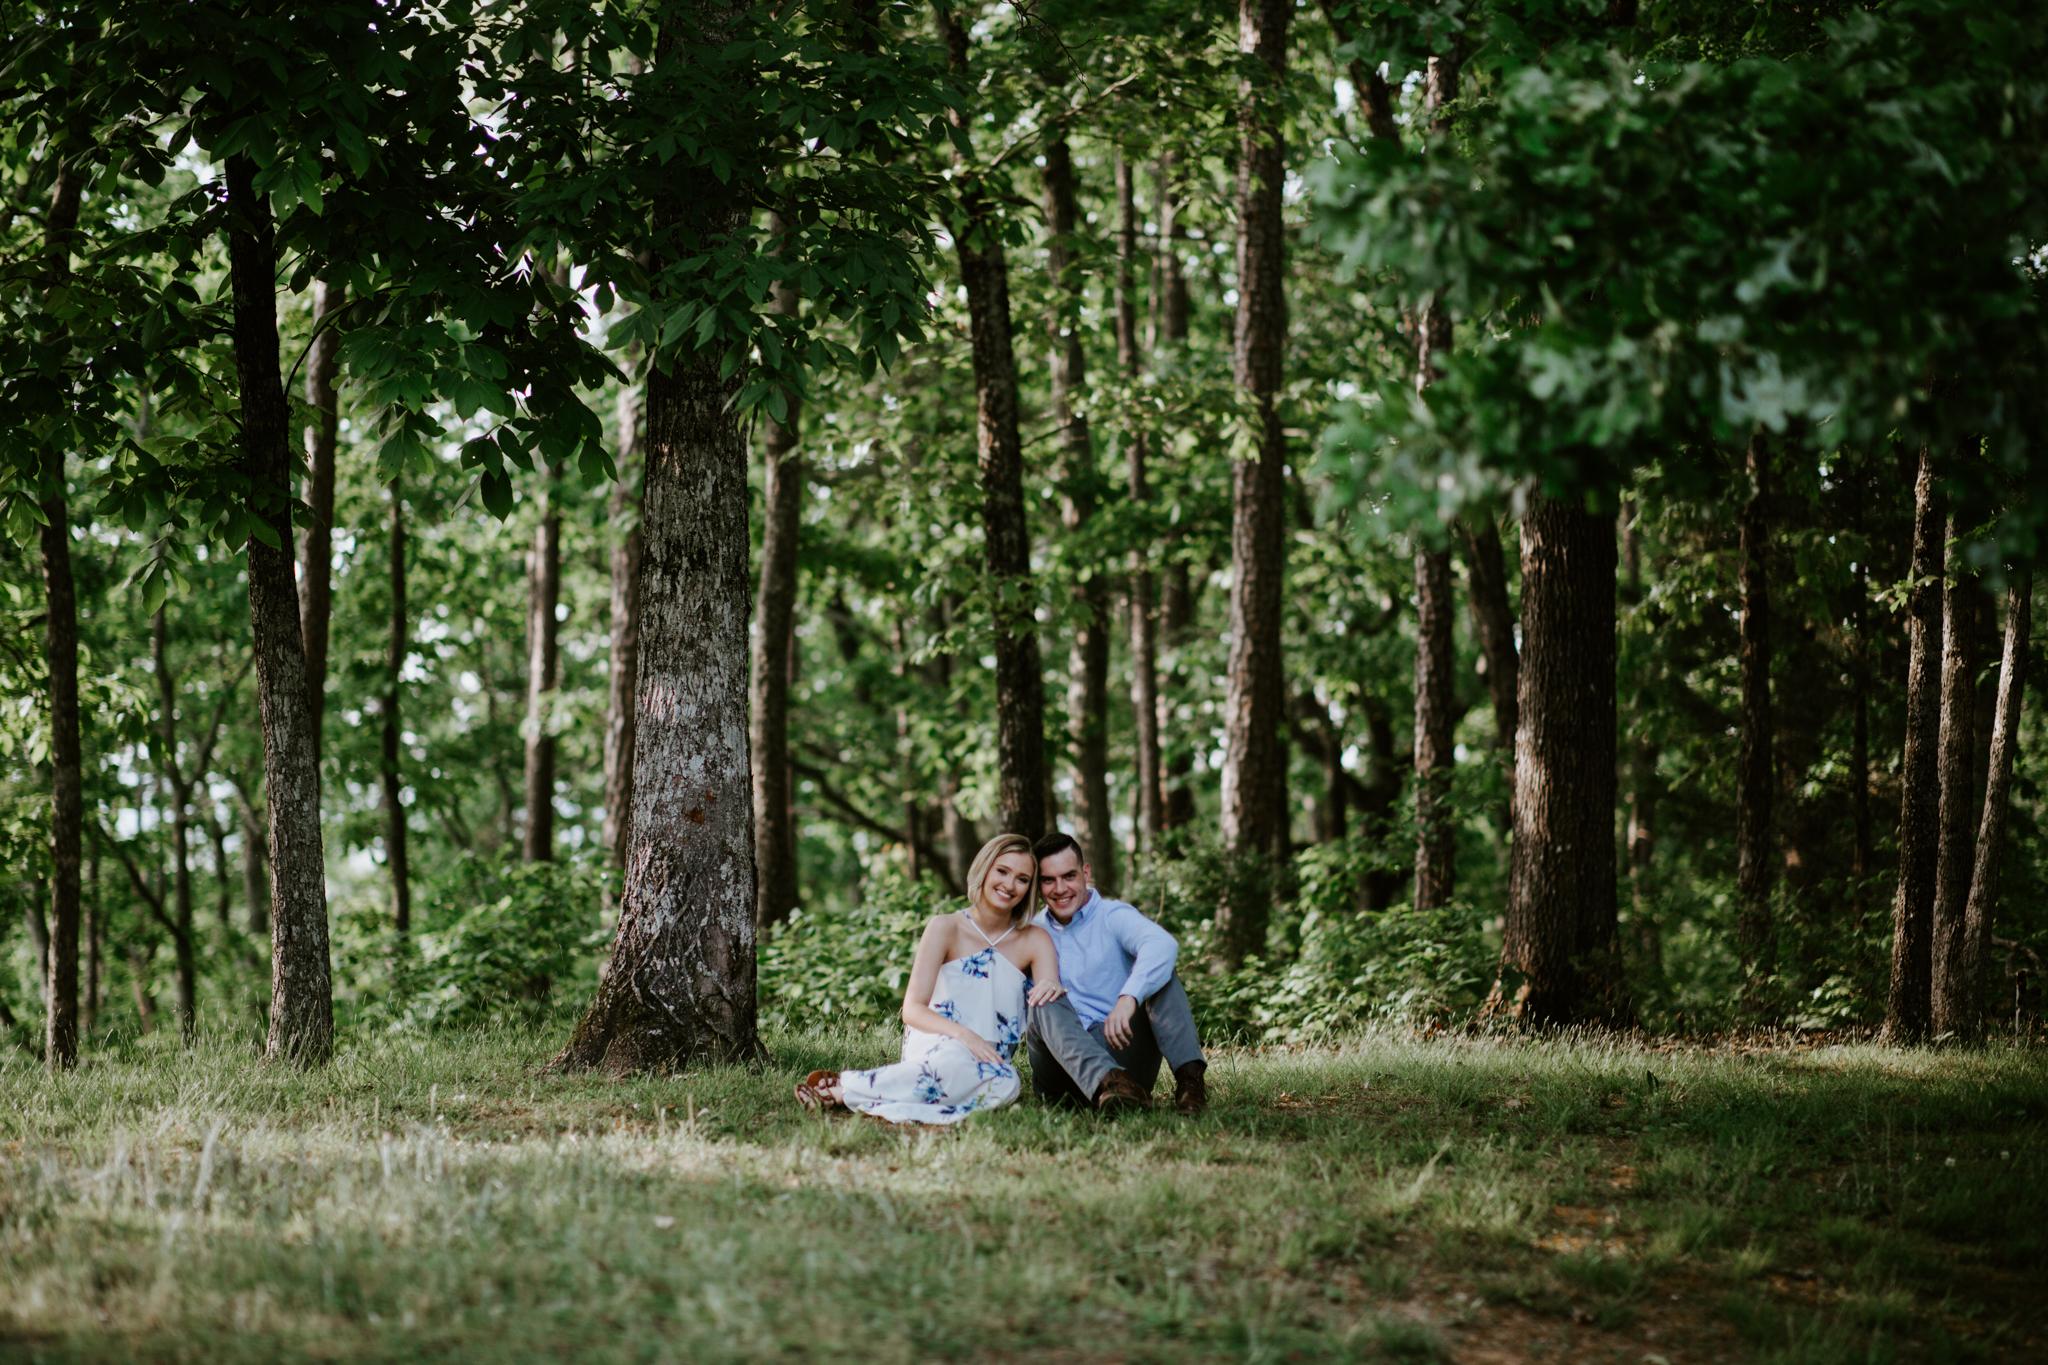 Courtney-Jordan-Chattanooga-Nashville-Tennessee-Wedding-Elopement-Photographer-74.jpg